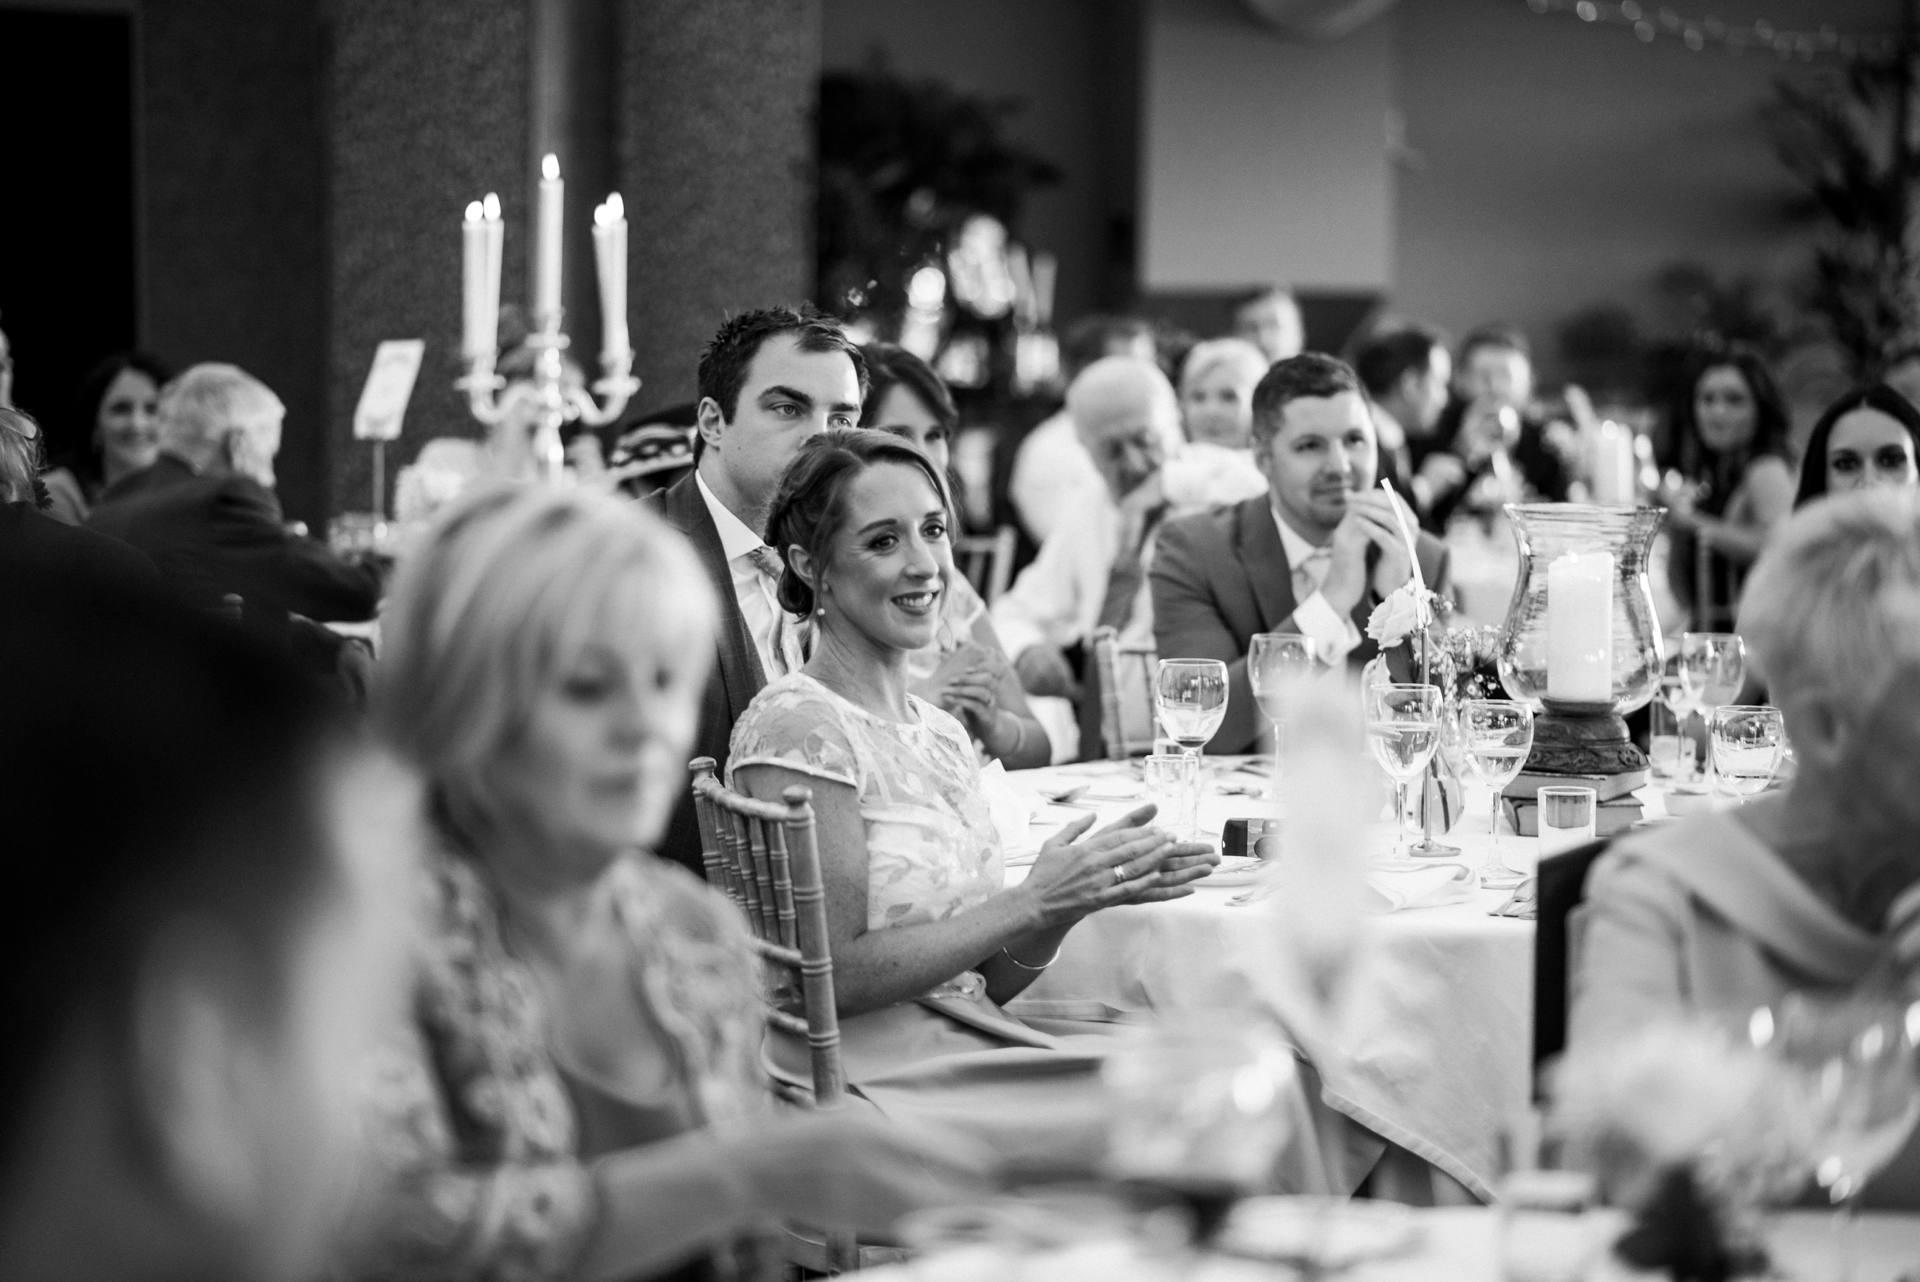 Guests at a wedding